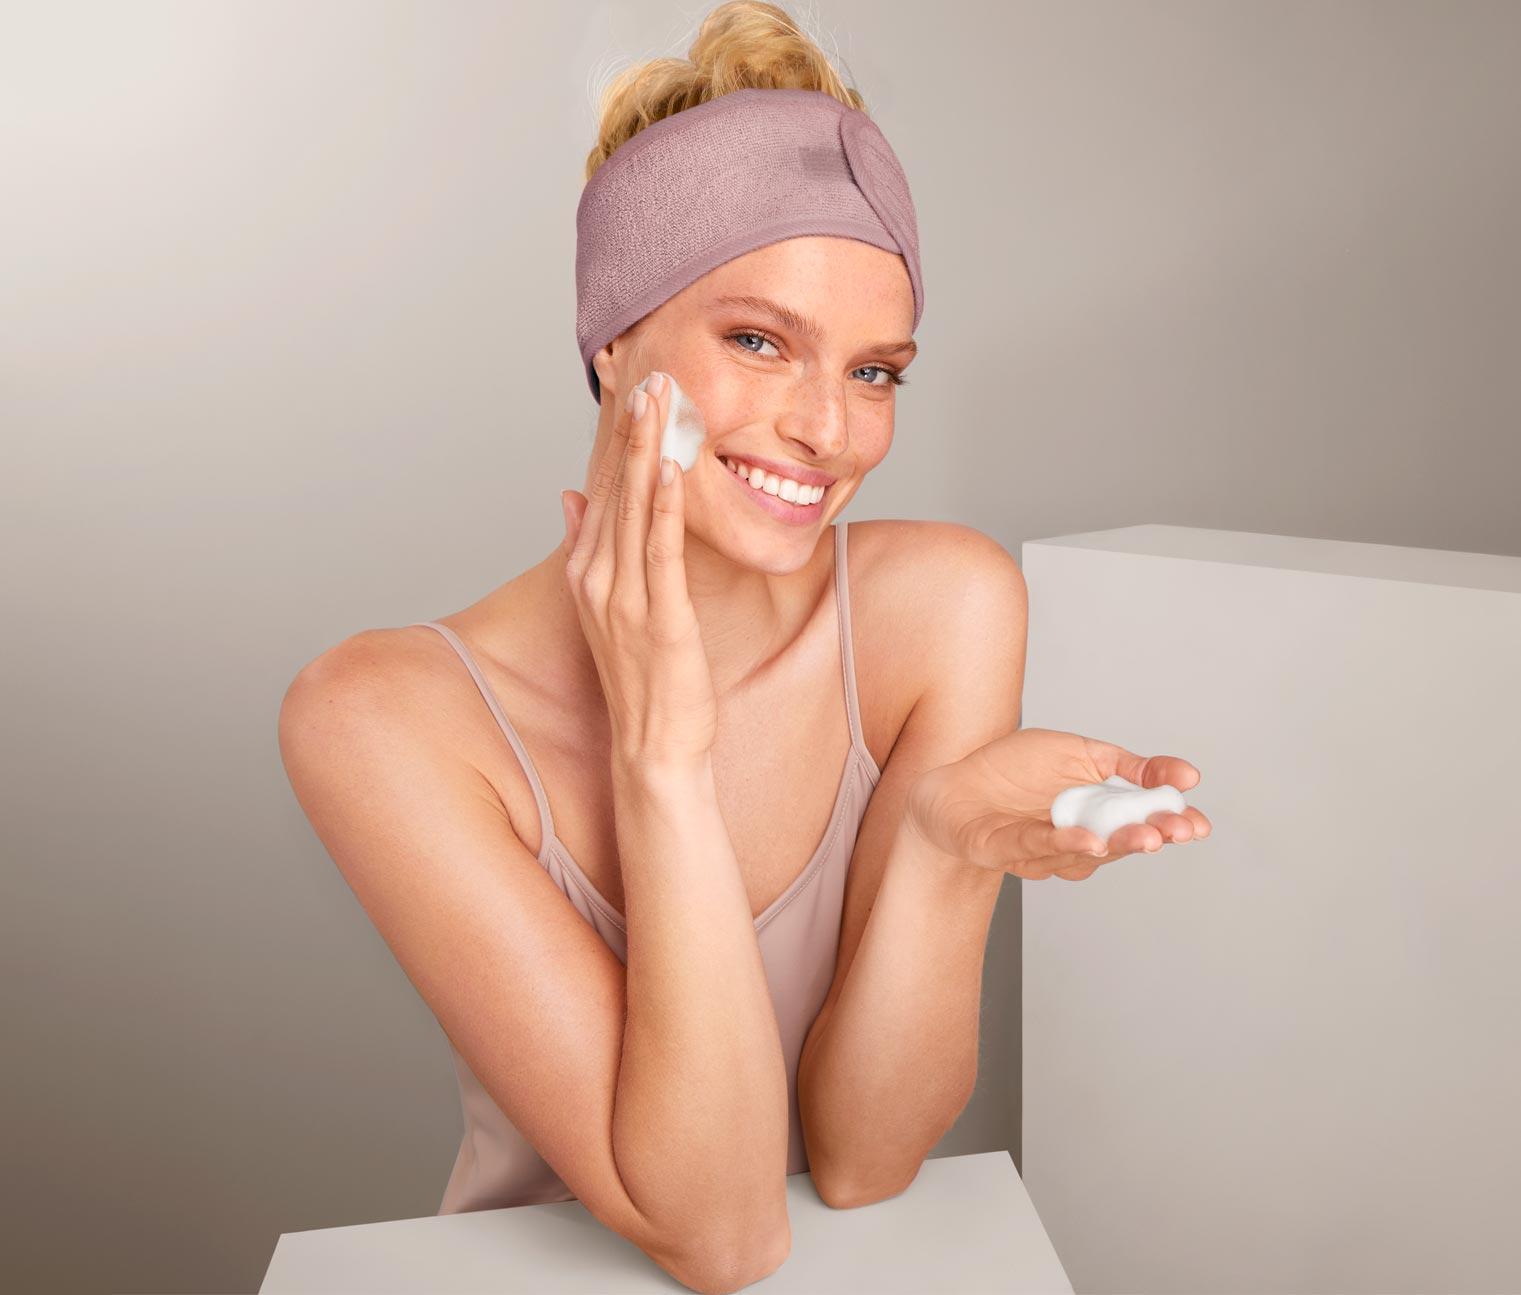 Image of 2 Kosmetik-Stirnbänder